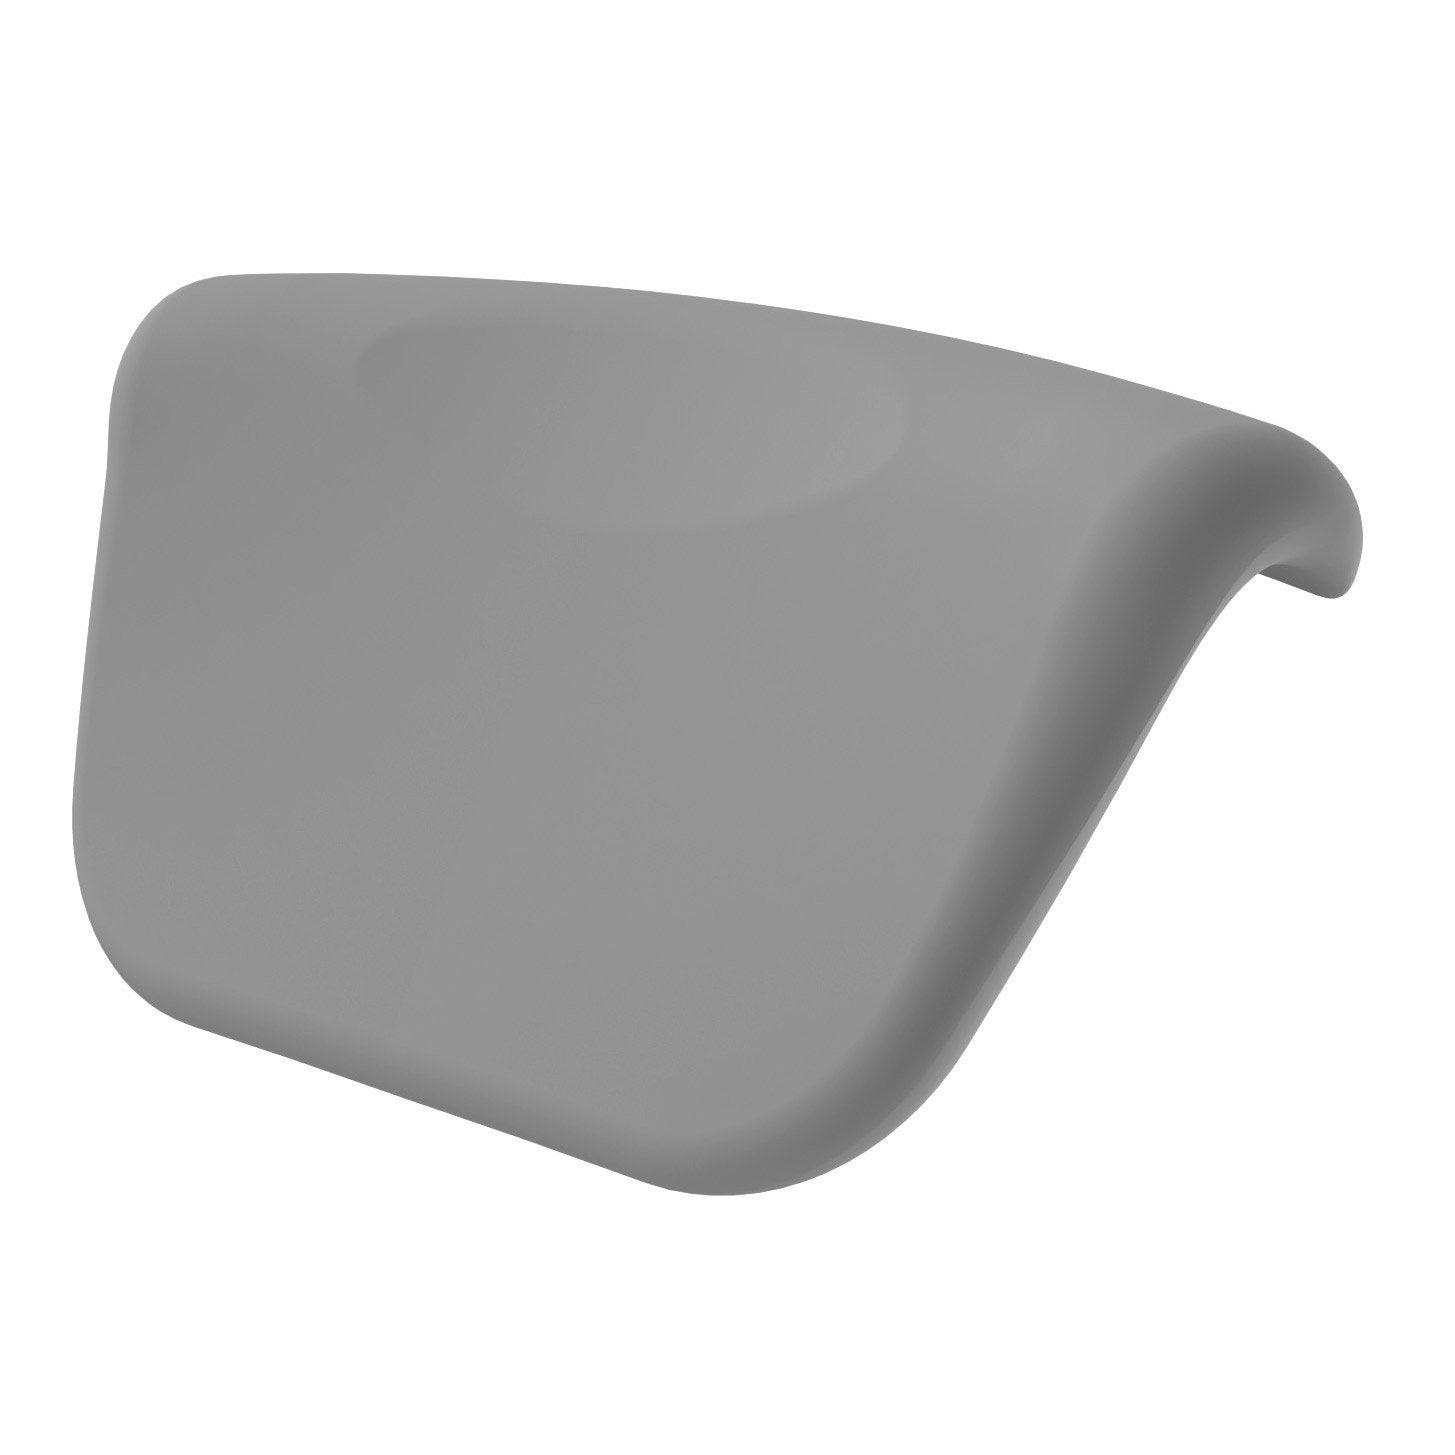 Repose Tete Baignoire Ikea repose-tête l.26x l.15 cm gris, sensea premium confort